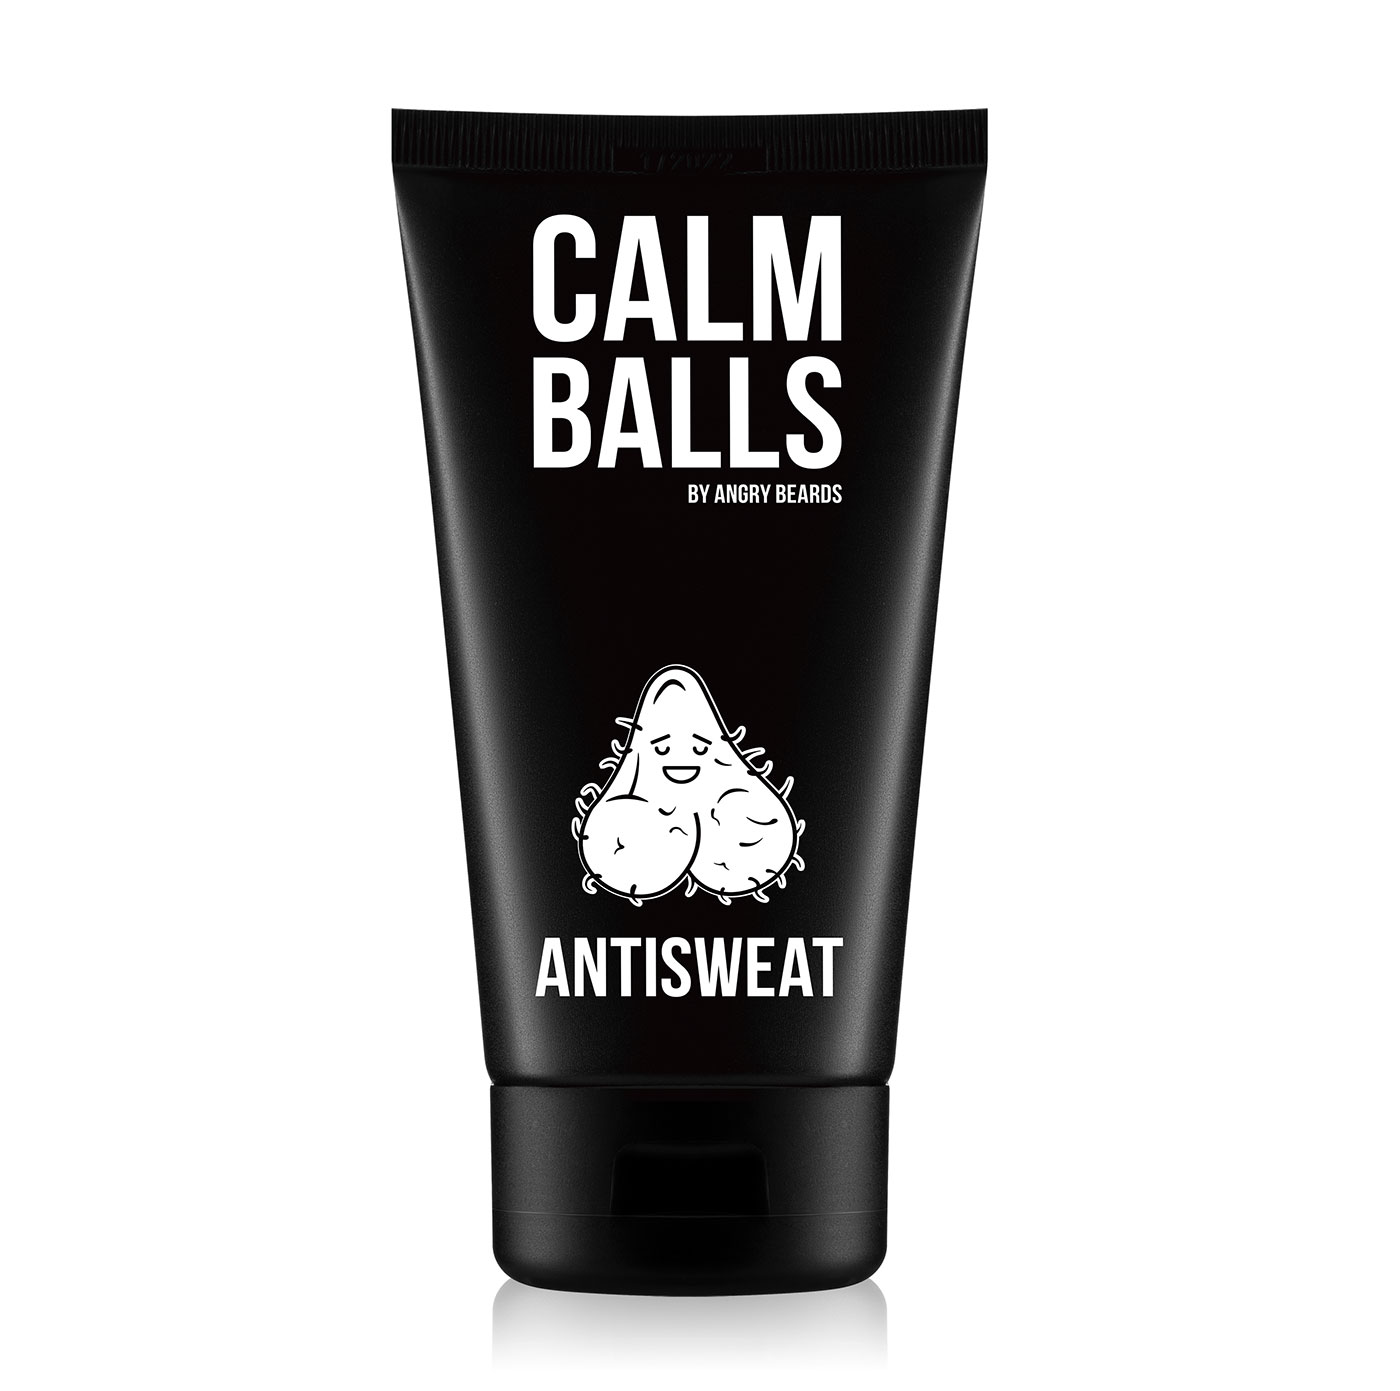 angry-beards-calm-balls-p1-1400px